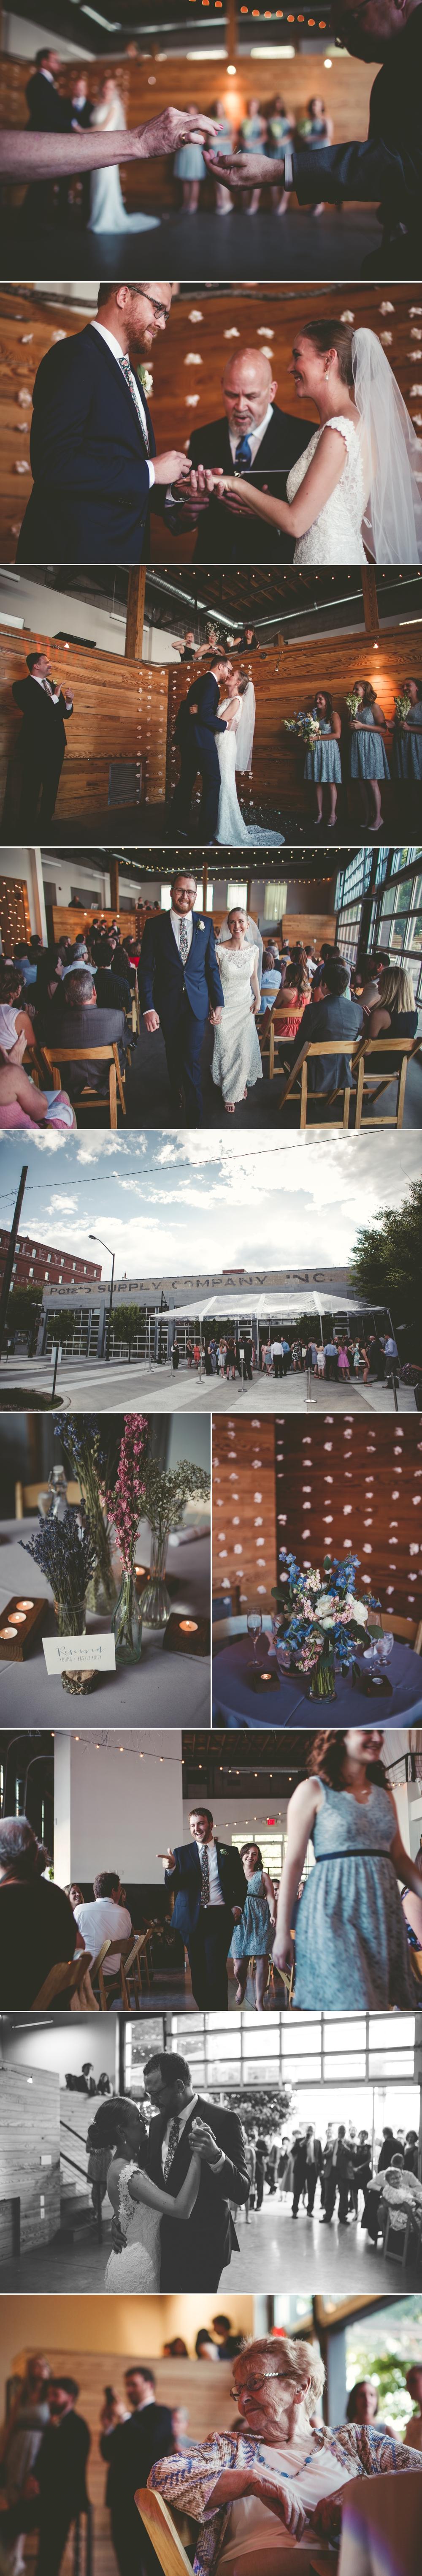 jason_domingues_photography_best_kansas_city_photographer_kc_weddings_river_market_event_place_31.jpg